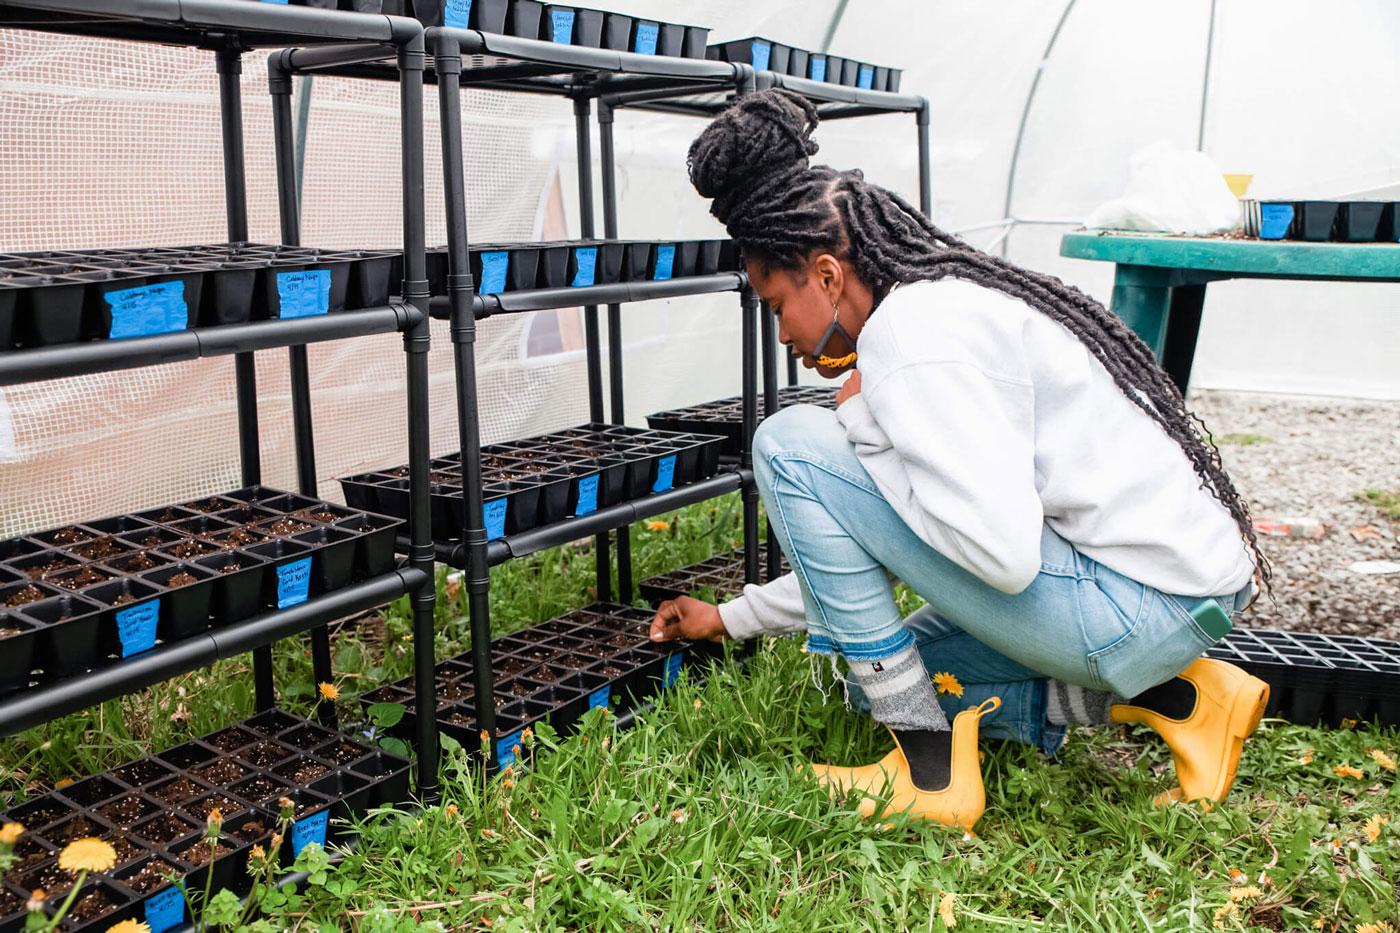 Christa tending to her nursery plants.